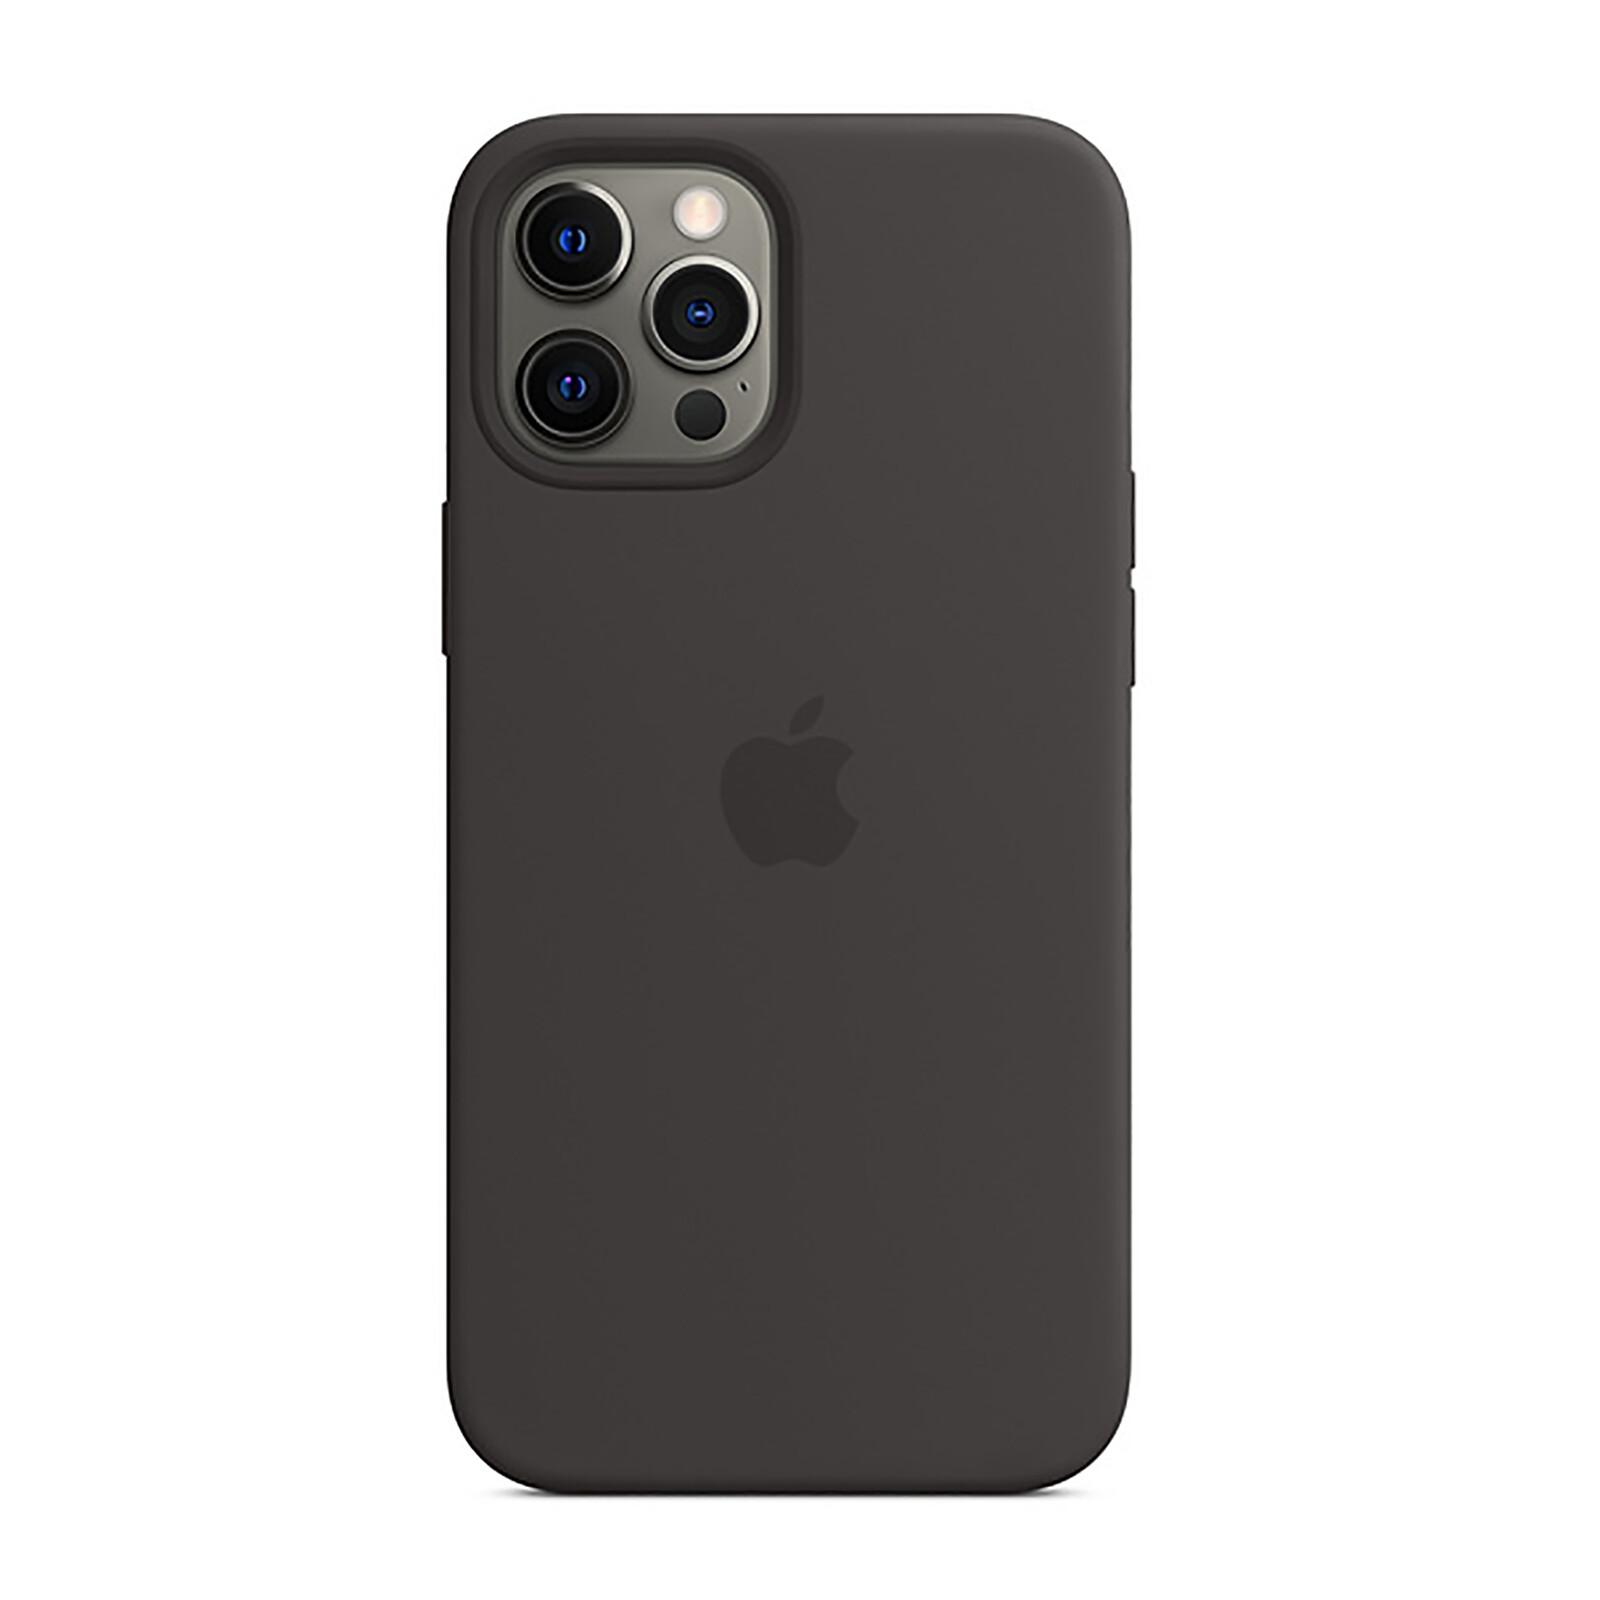 Apple iPhone 12 Pro Max Silikon Case mit MagSafe schwarz